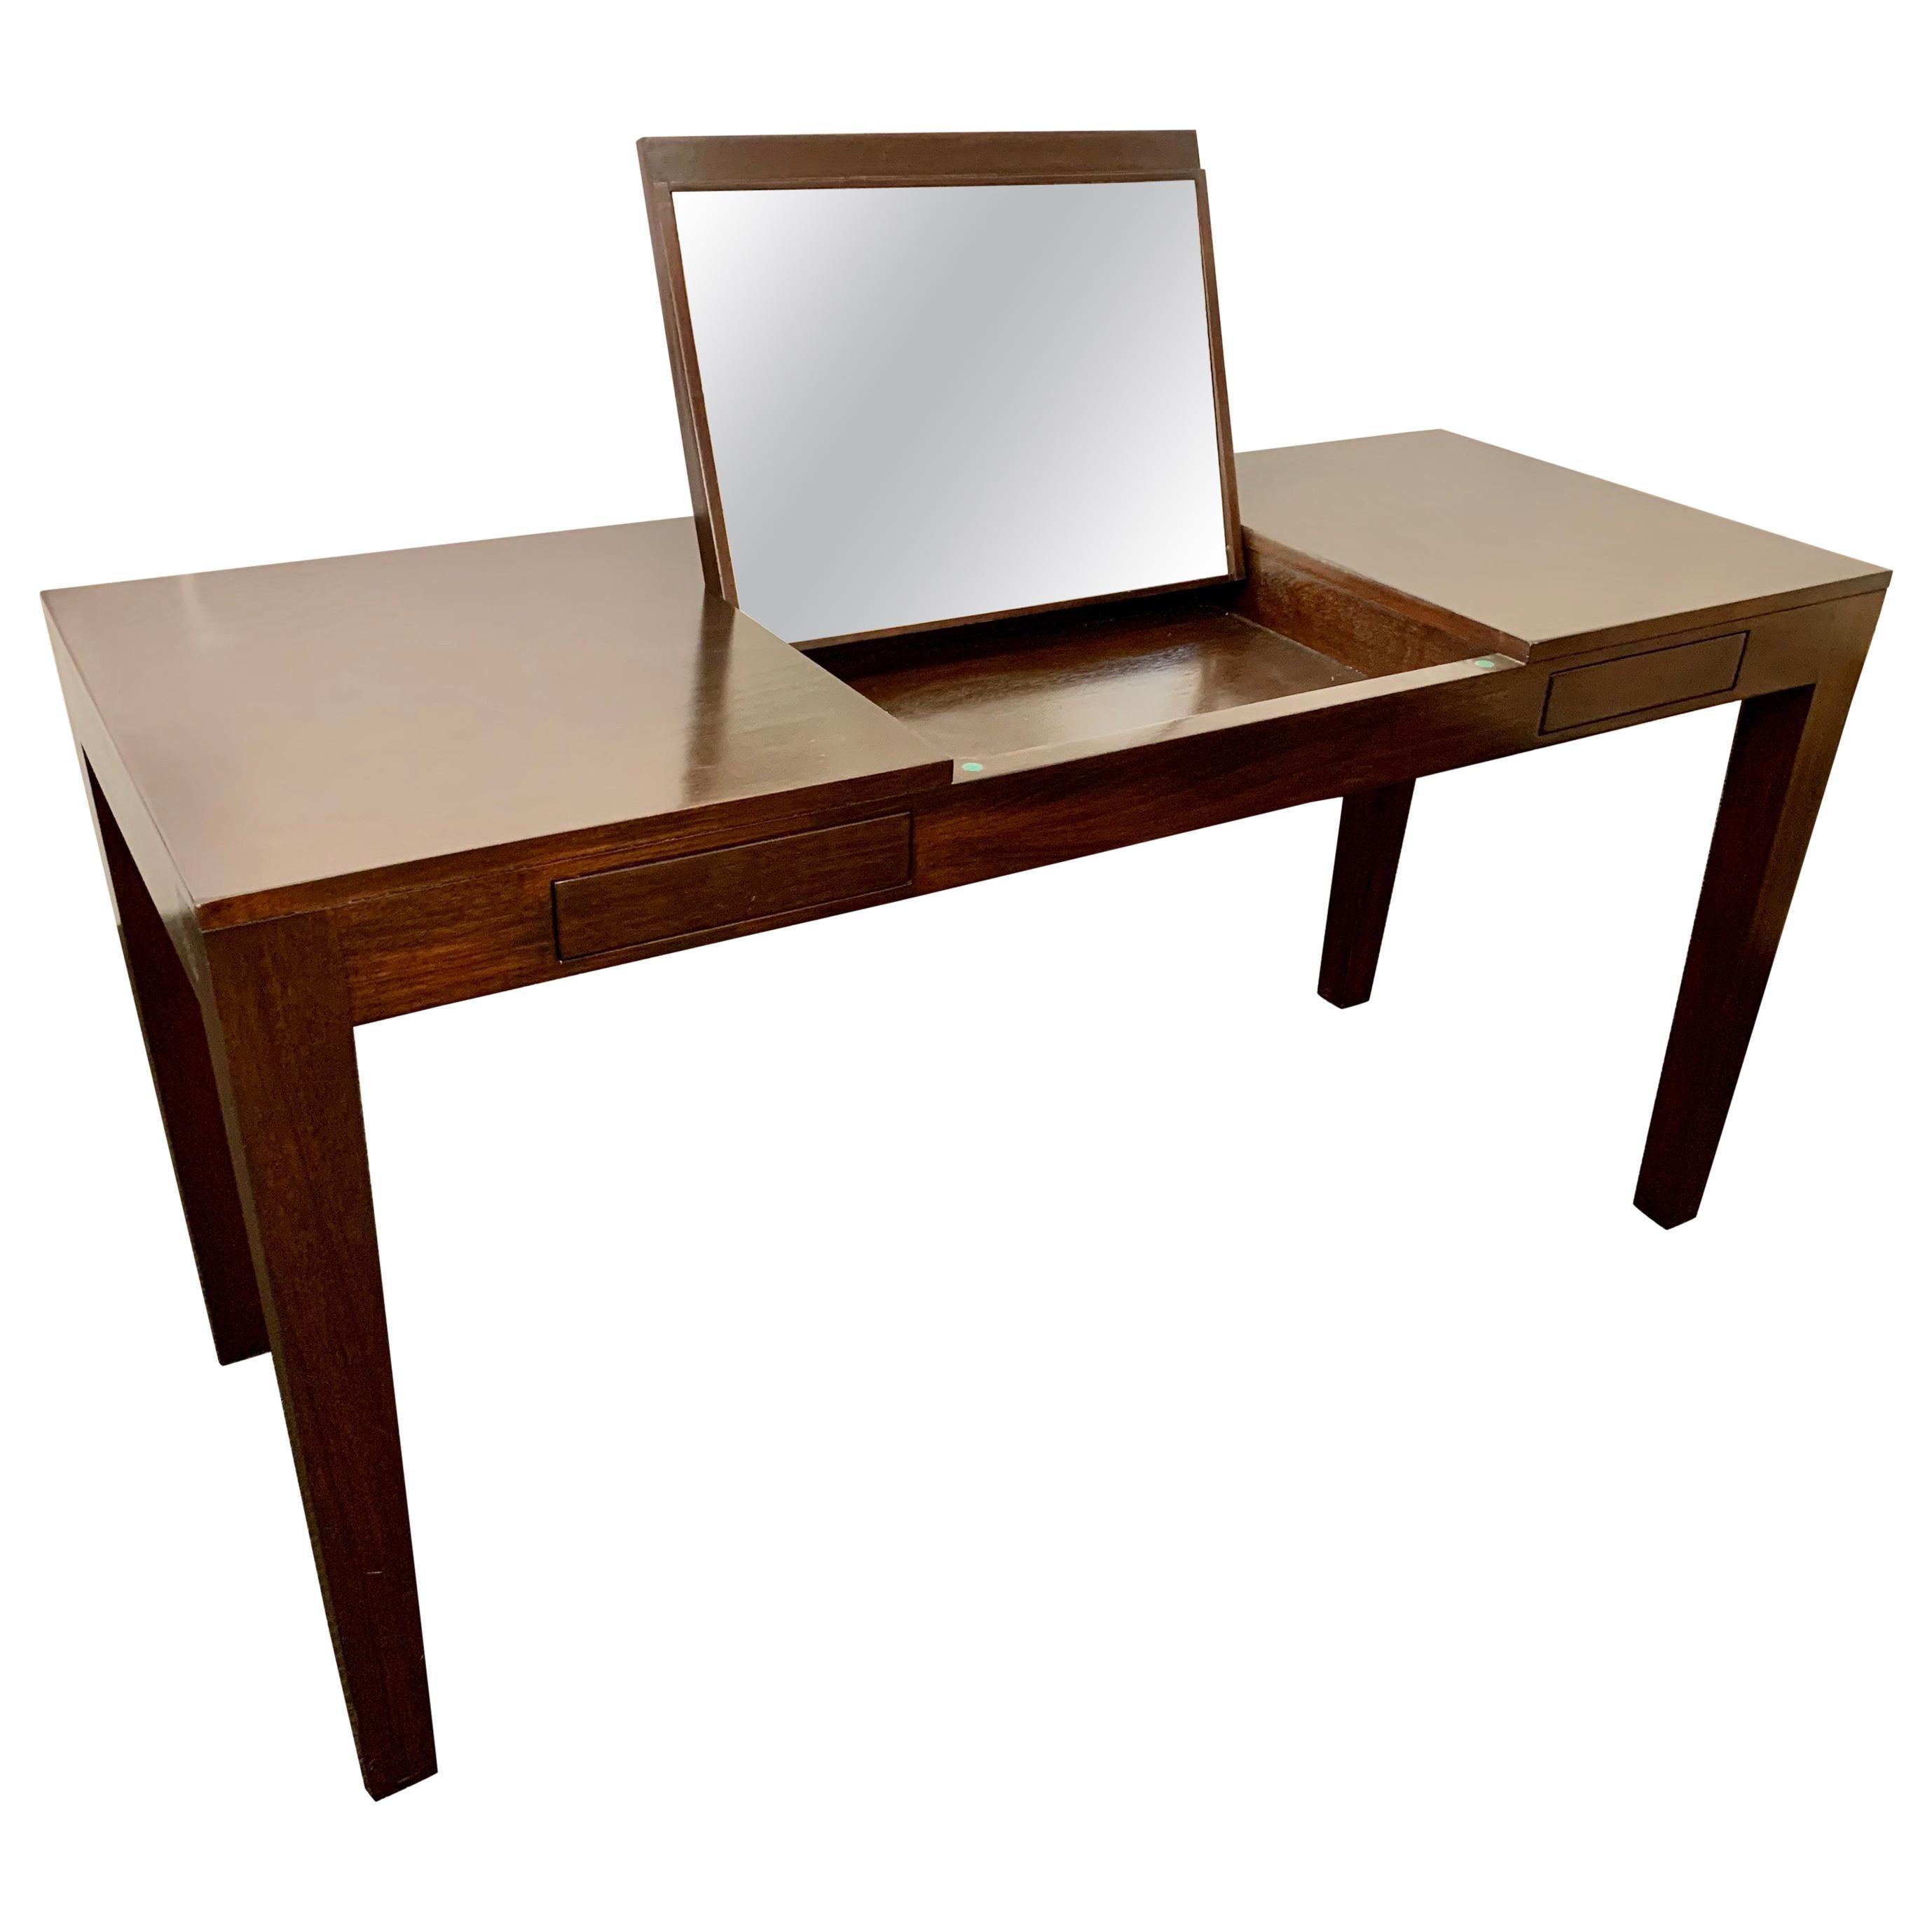 Espresso Finish Art Deco Style Vanity/ Writing Desk